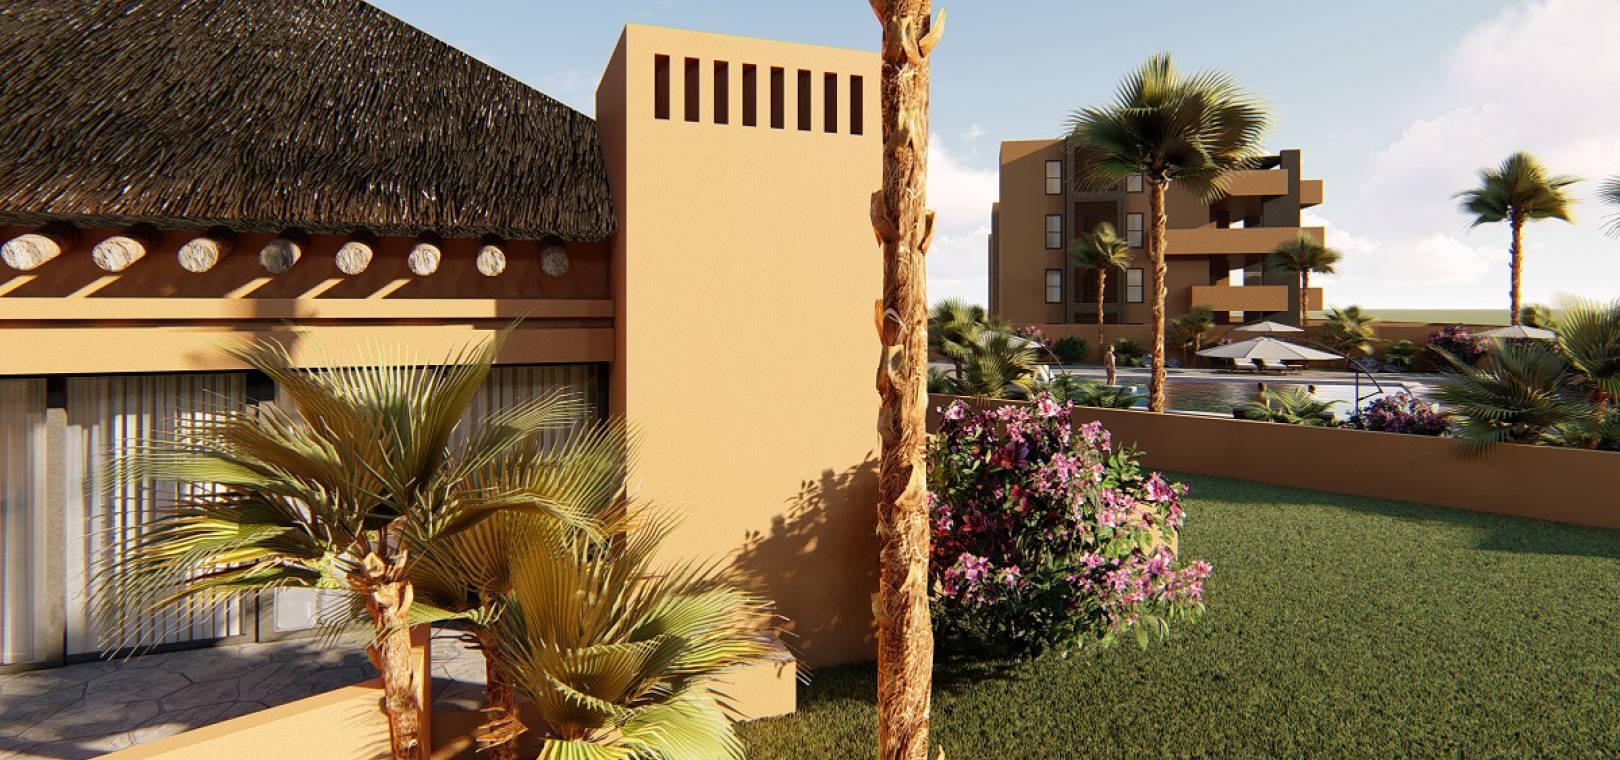 Palapa_Golf_Villamartin_New_Build_Properties_For_Sale_20